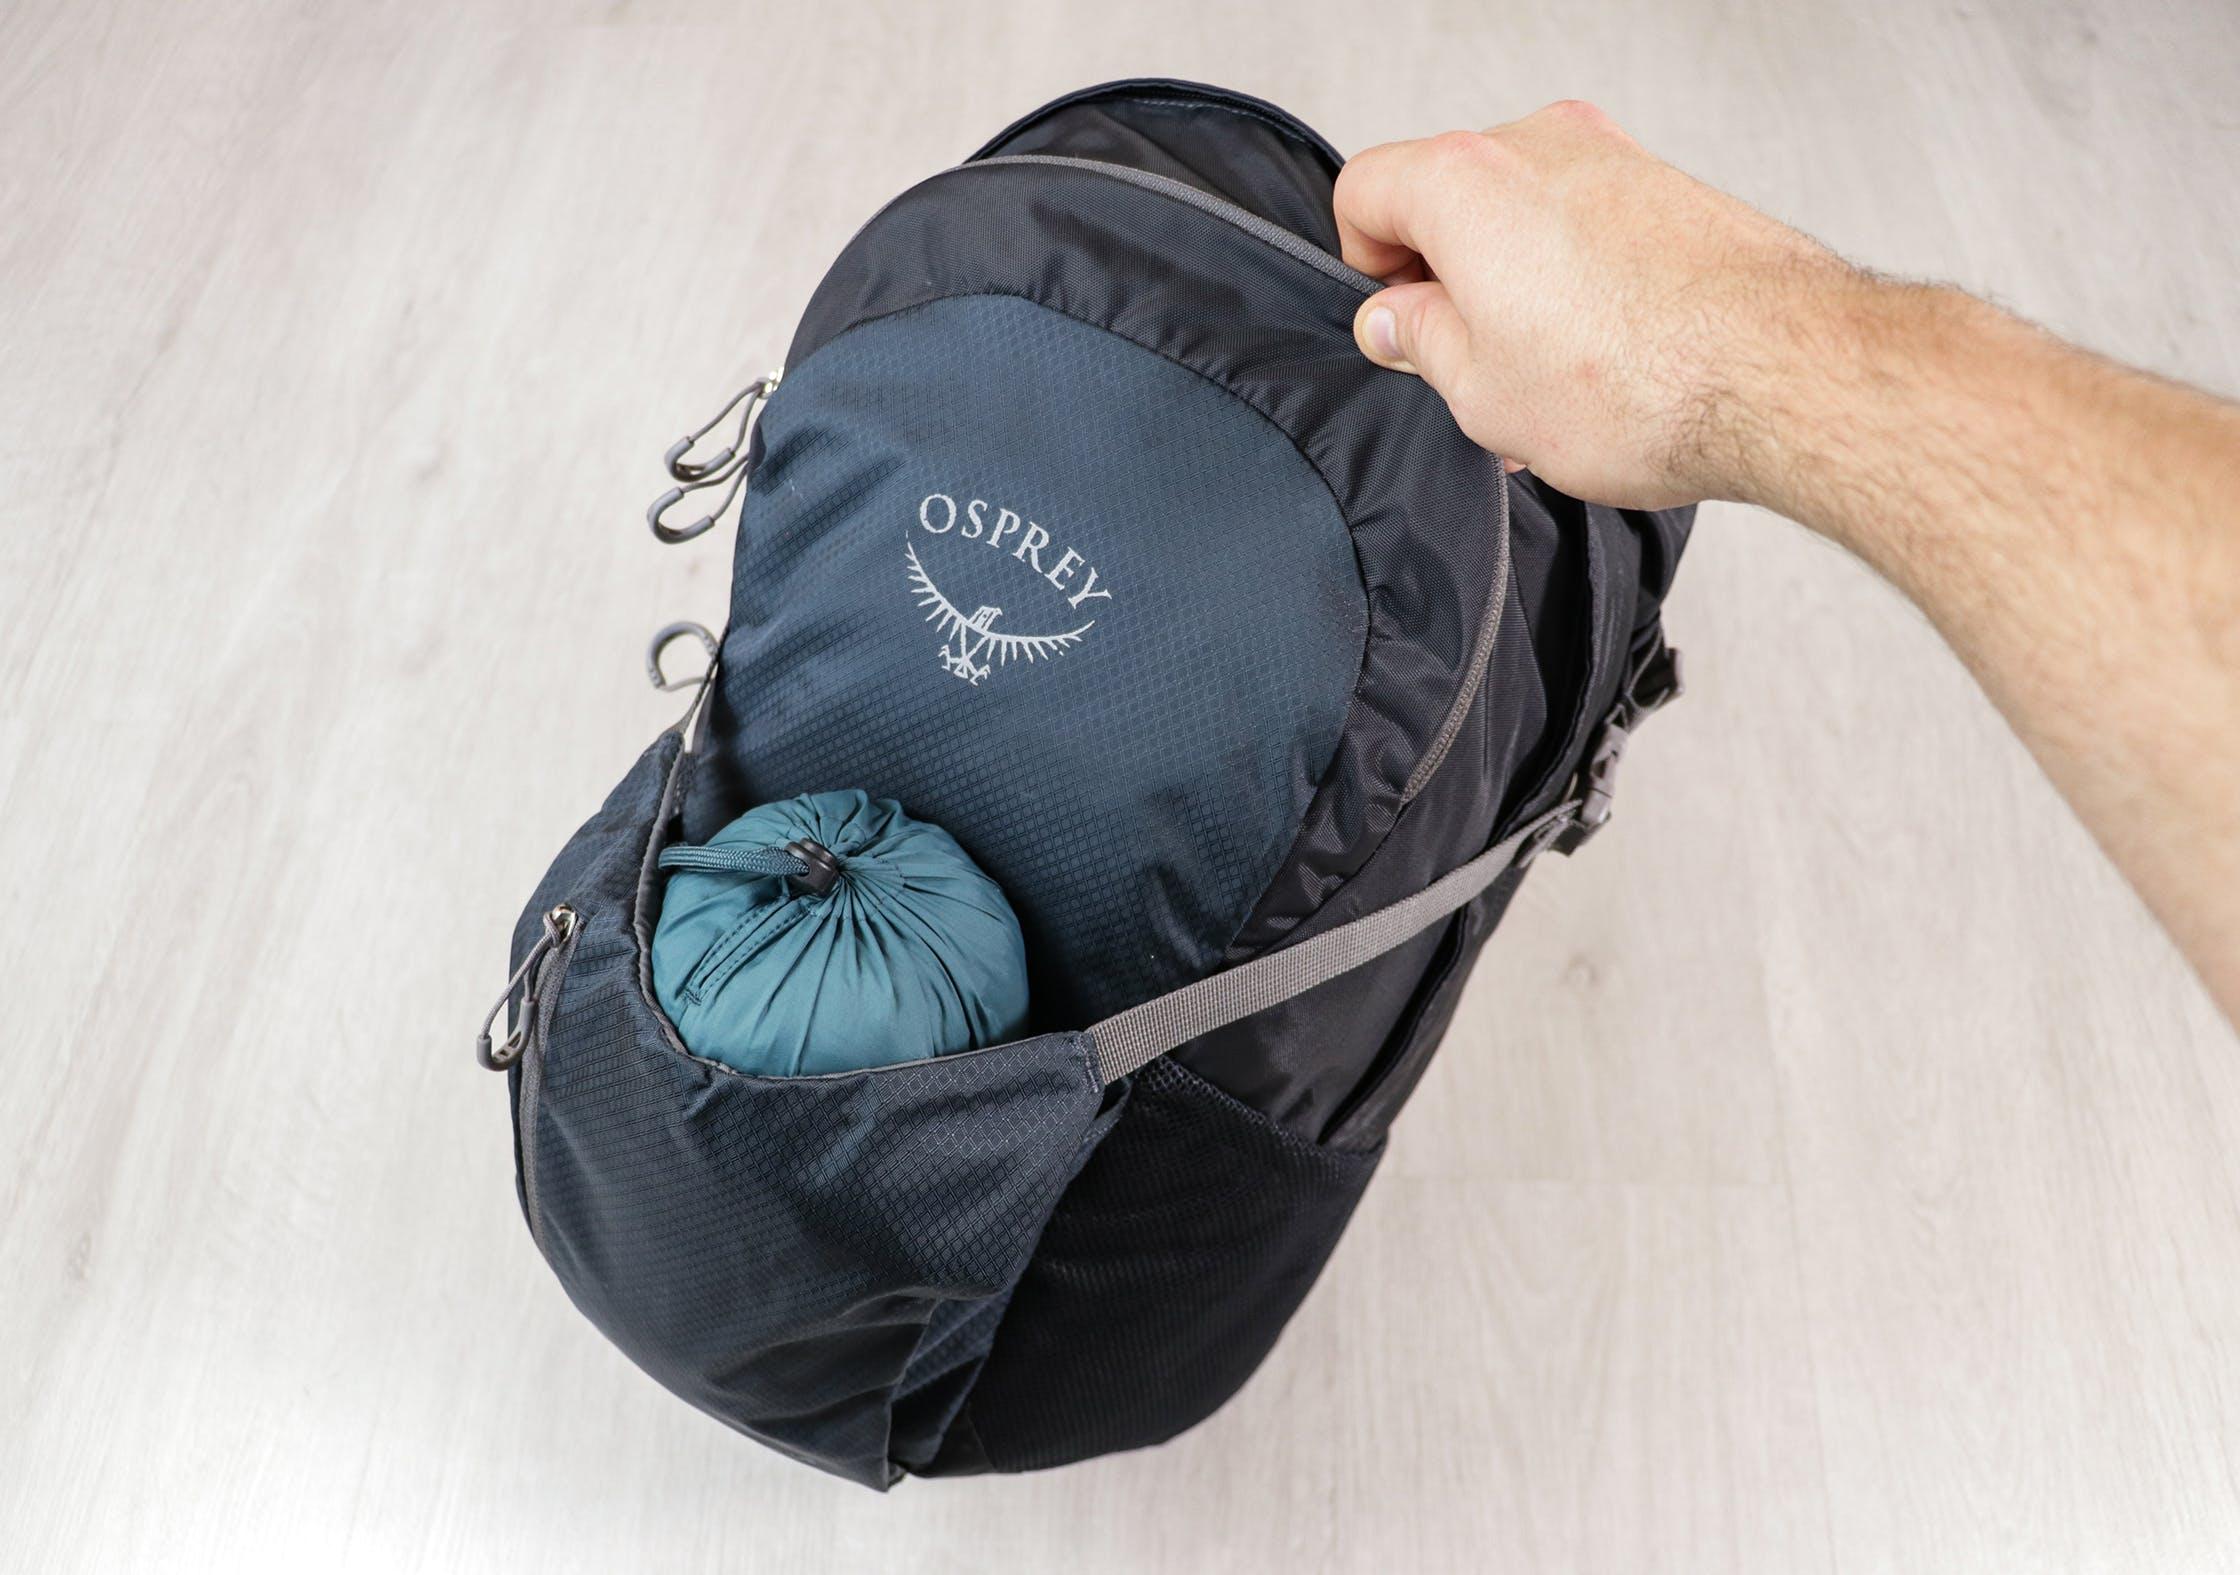 Osprey Daylite Plus Front Stretch Pocket